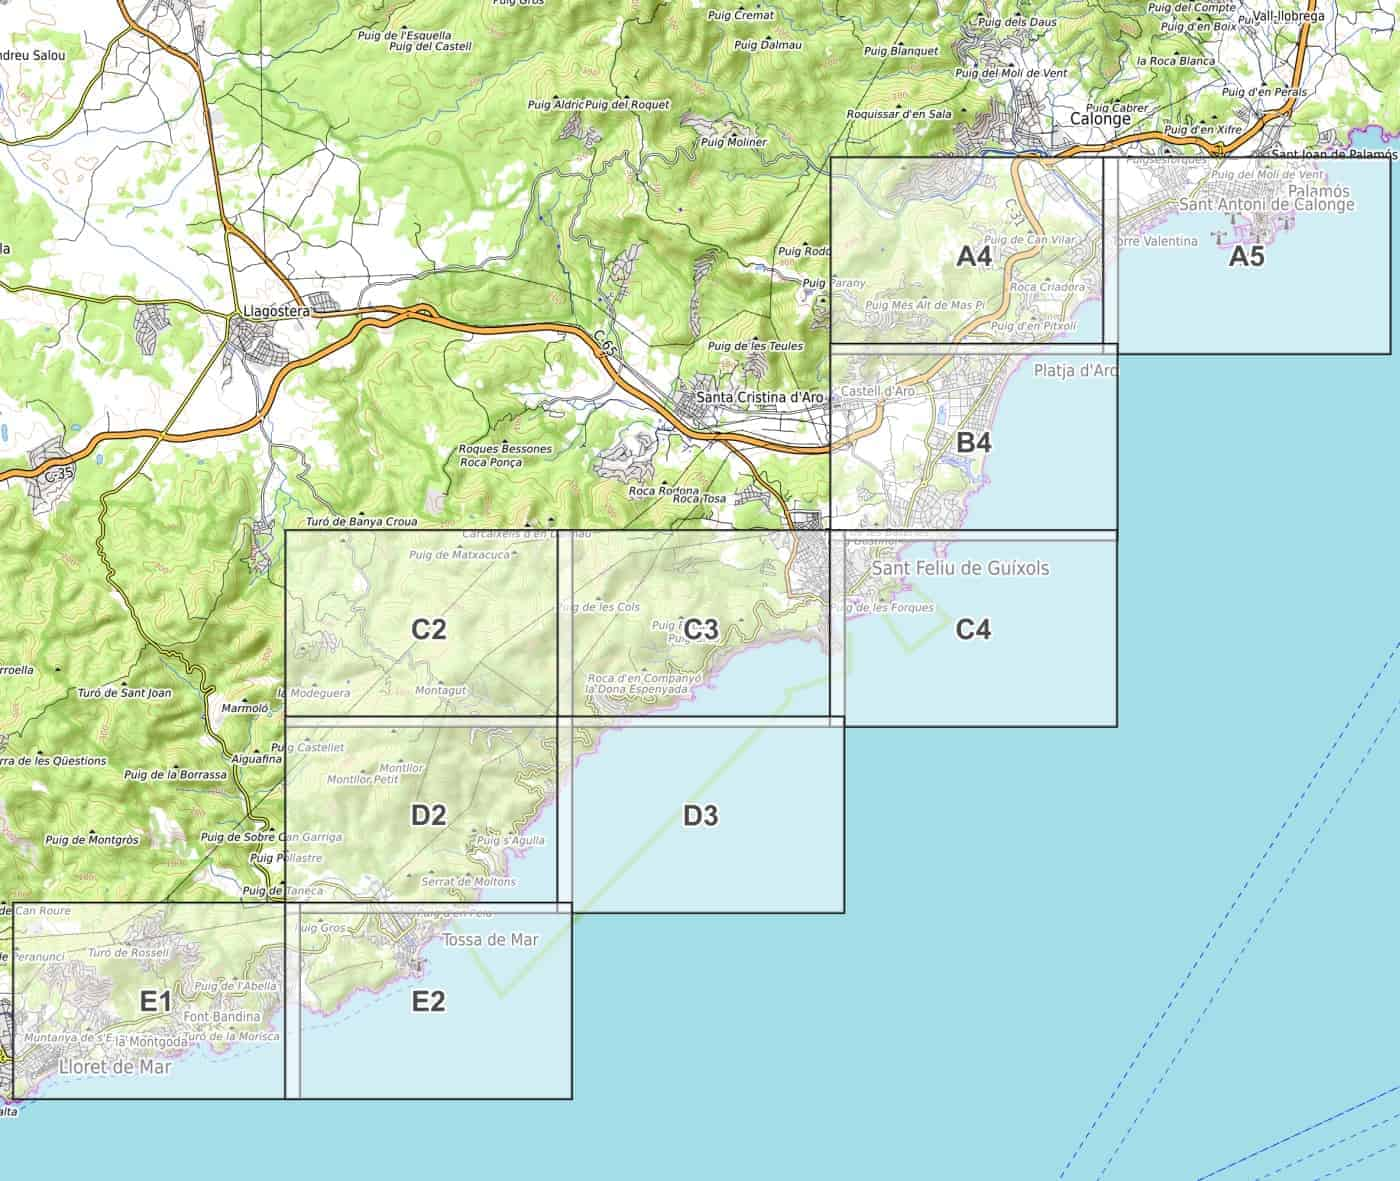 Spagna Costa Brava Cartina.Costa Brava Parte 3 Sud Cartina Escursionistica Pdf Da Scaricare 1 20 000 Wanderndeluxe